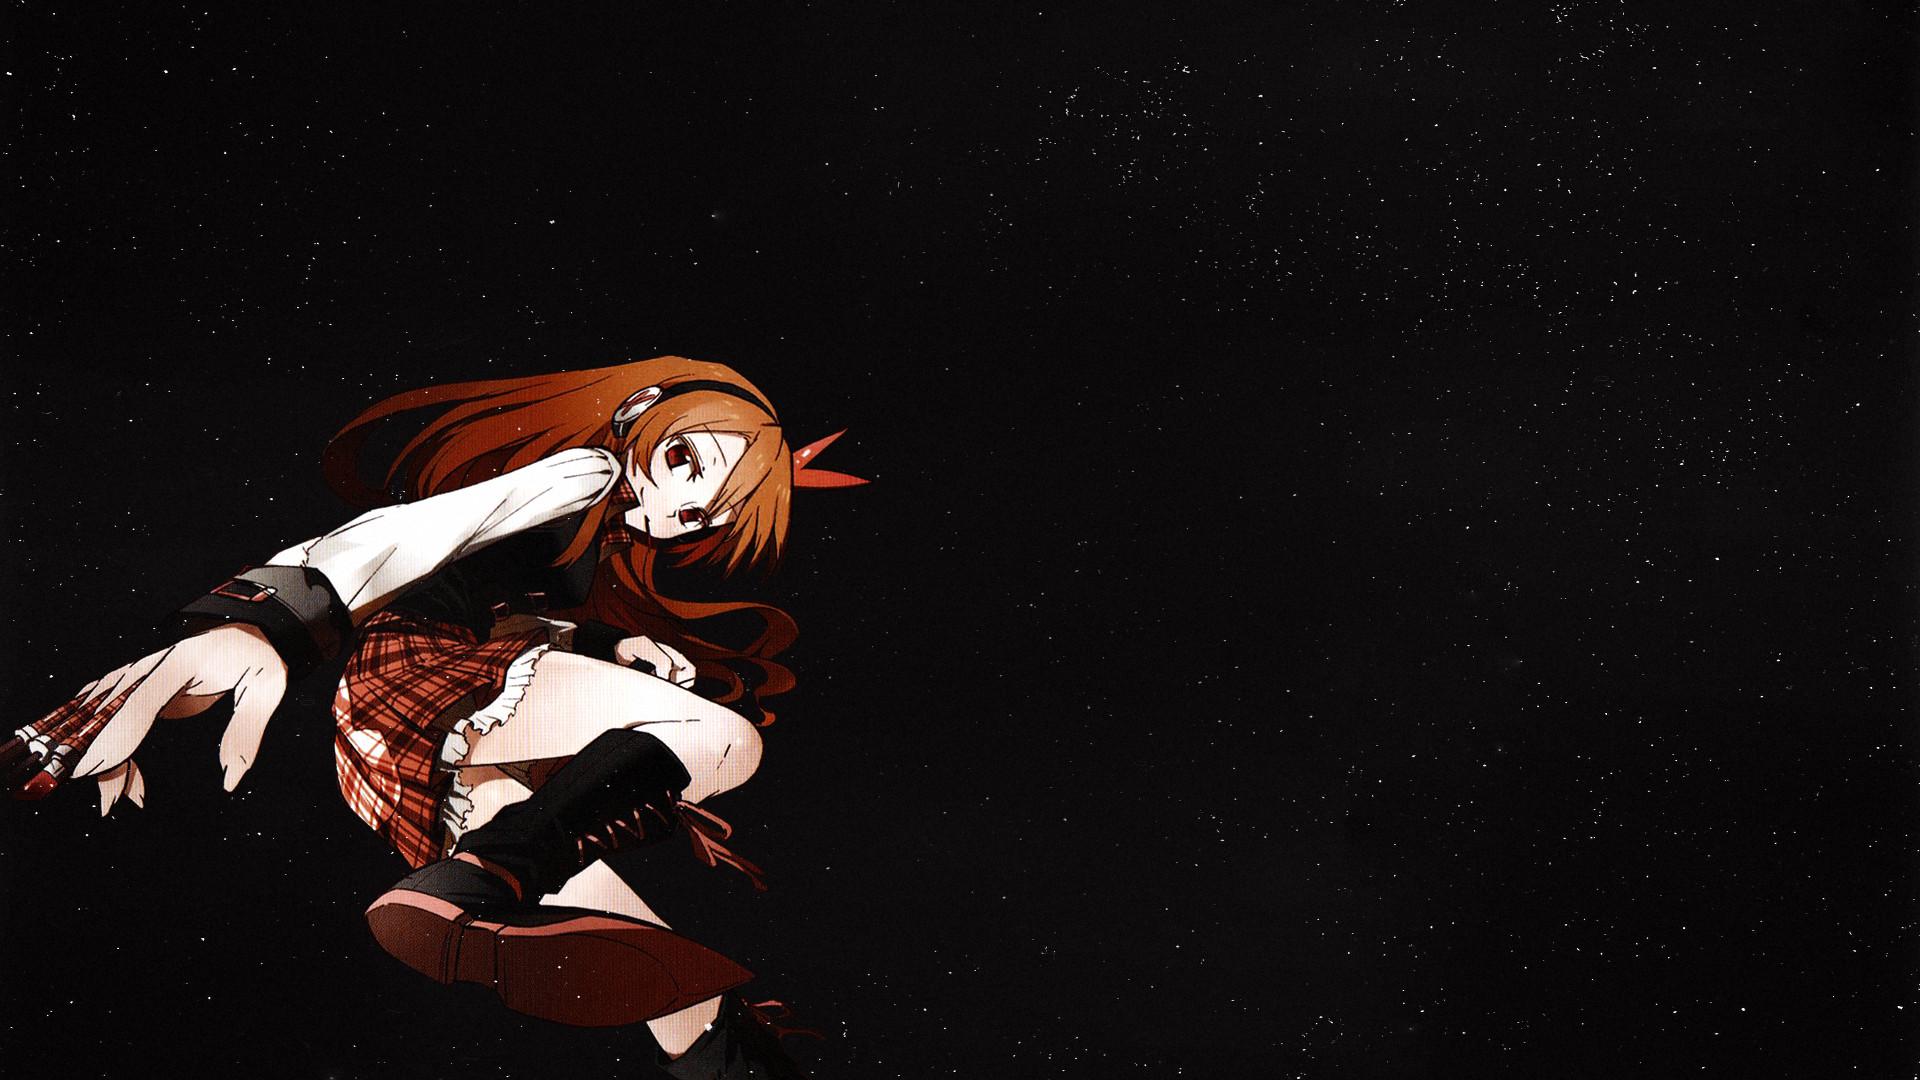 Akame Ga Kill Wallpaper 1920x1080 Posted By Ryan Walker